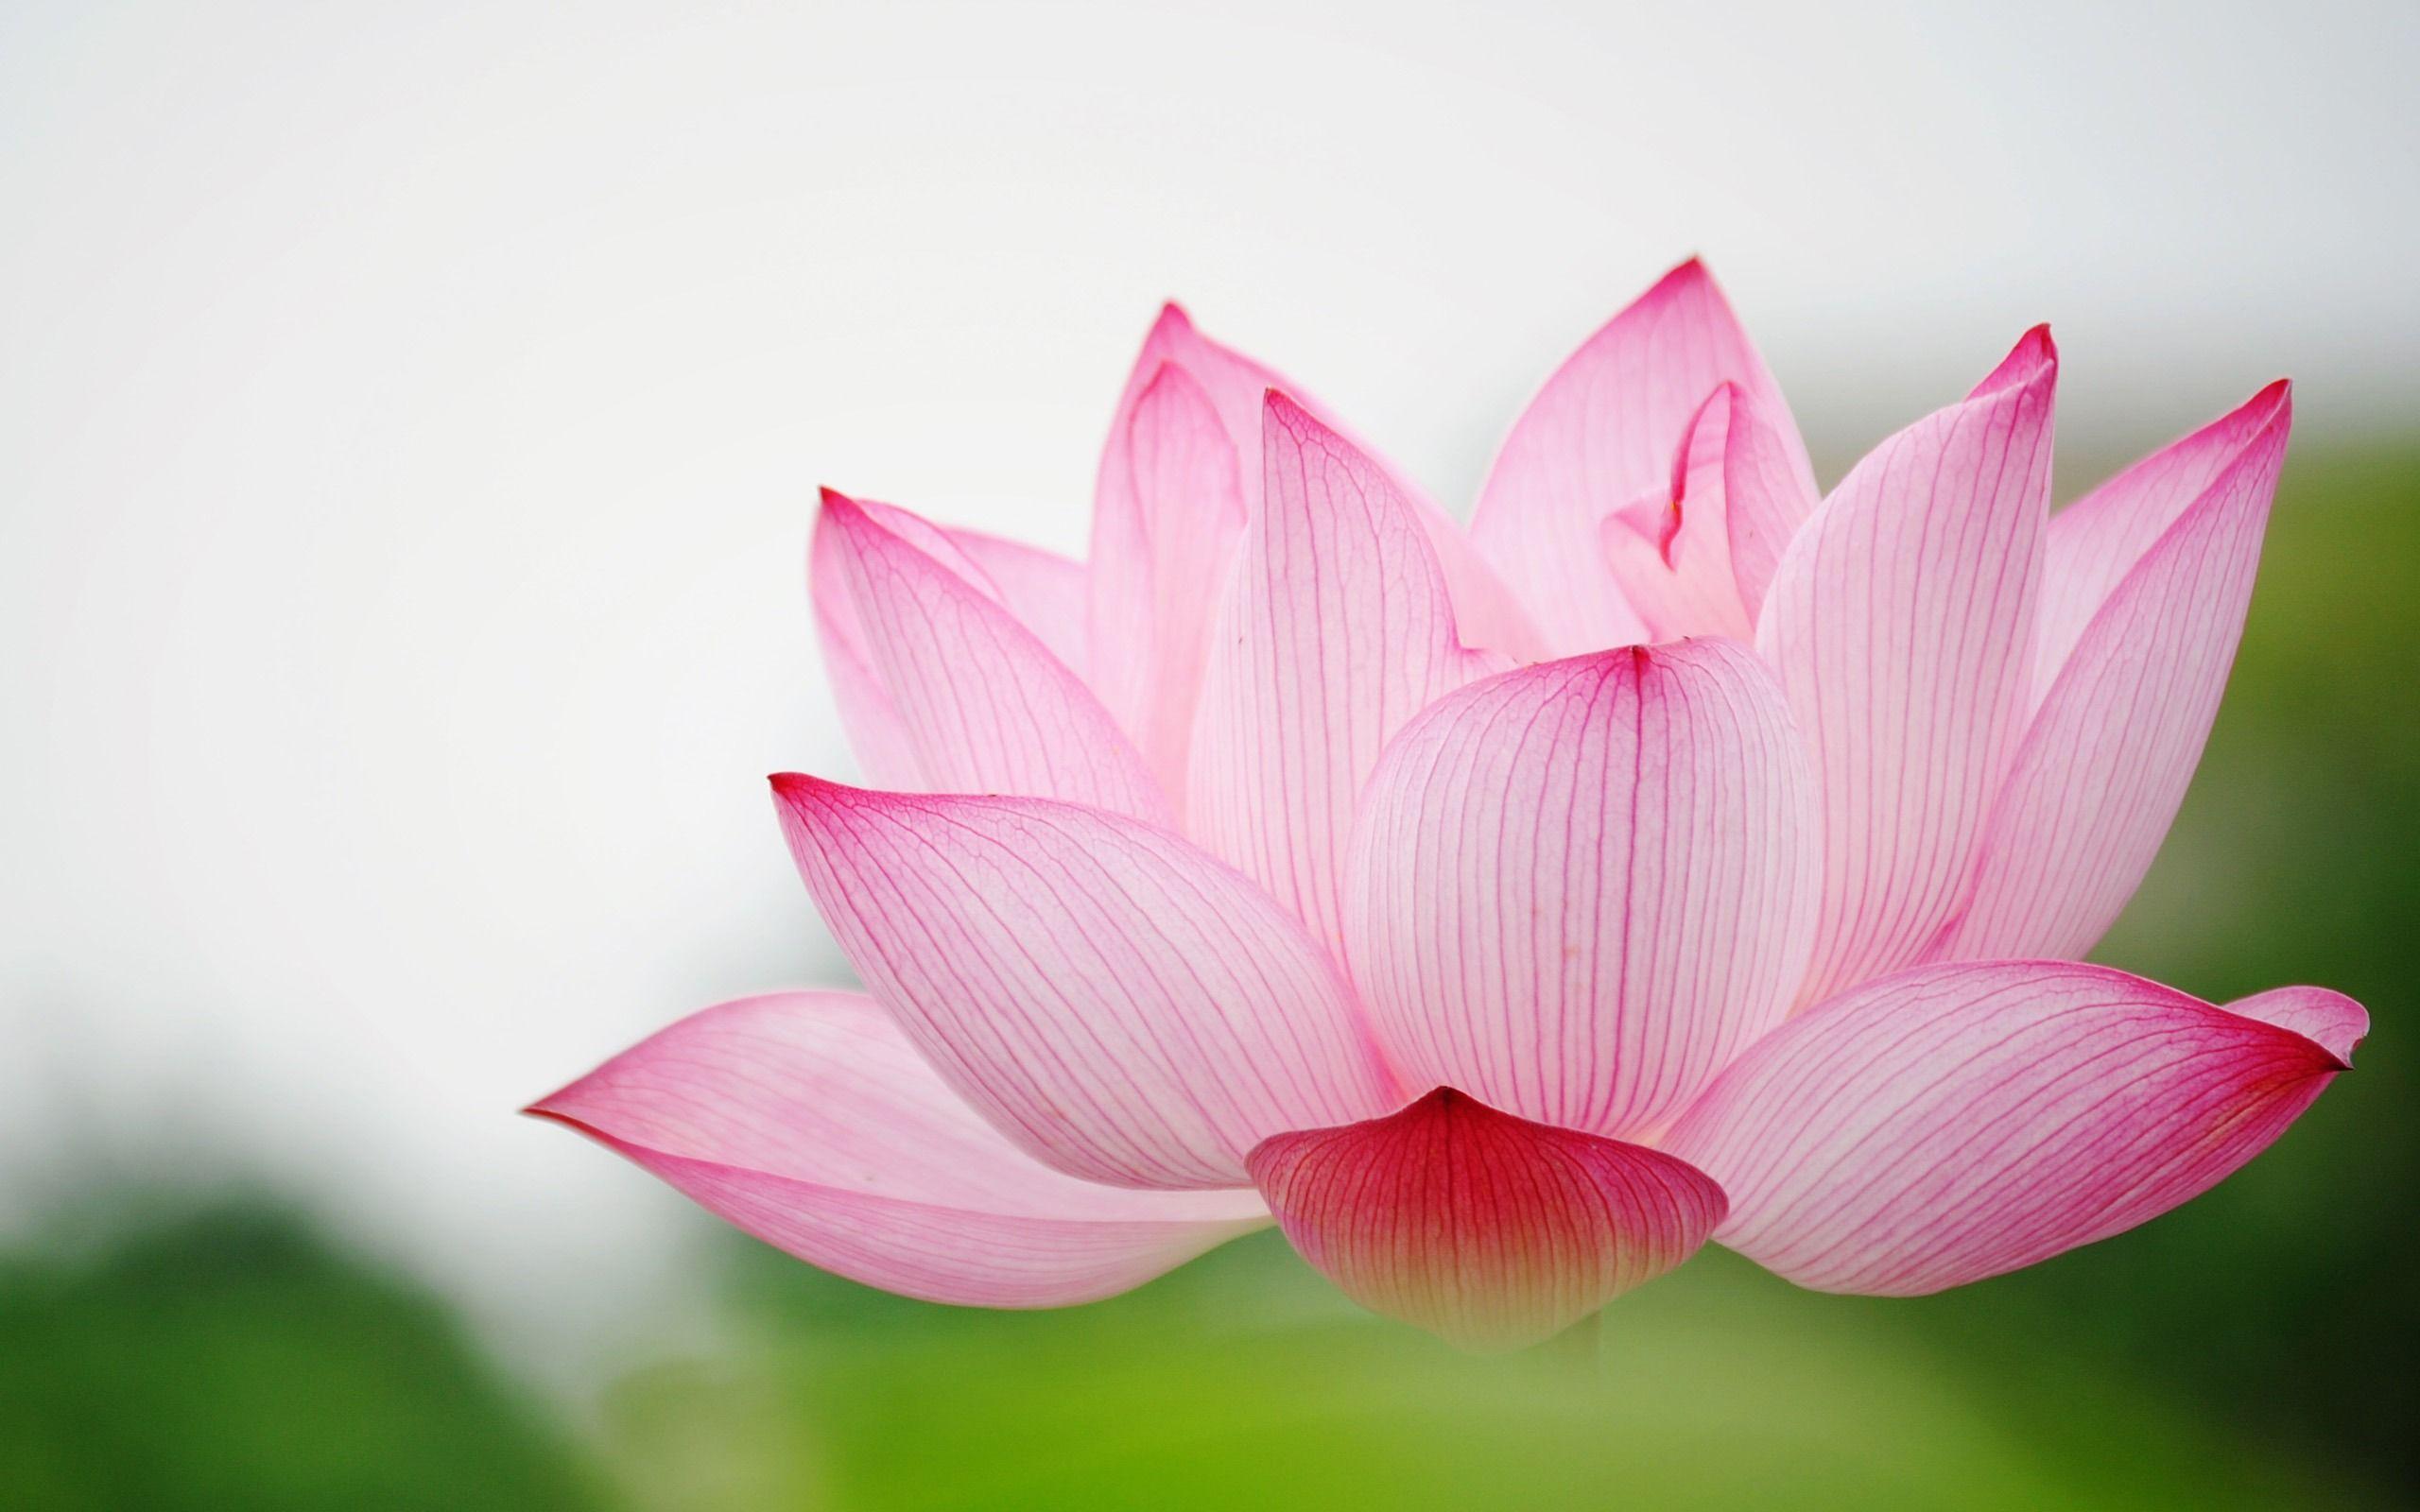 Pink lotus flower wallpaper wallpapersafari healing pink lotus flower wallpaper wallpapersafari izmirmasajfo